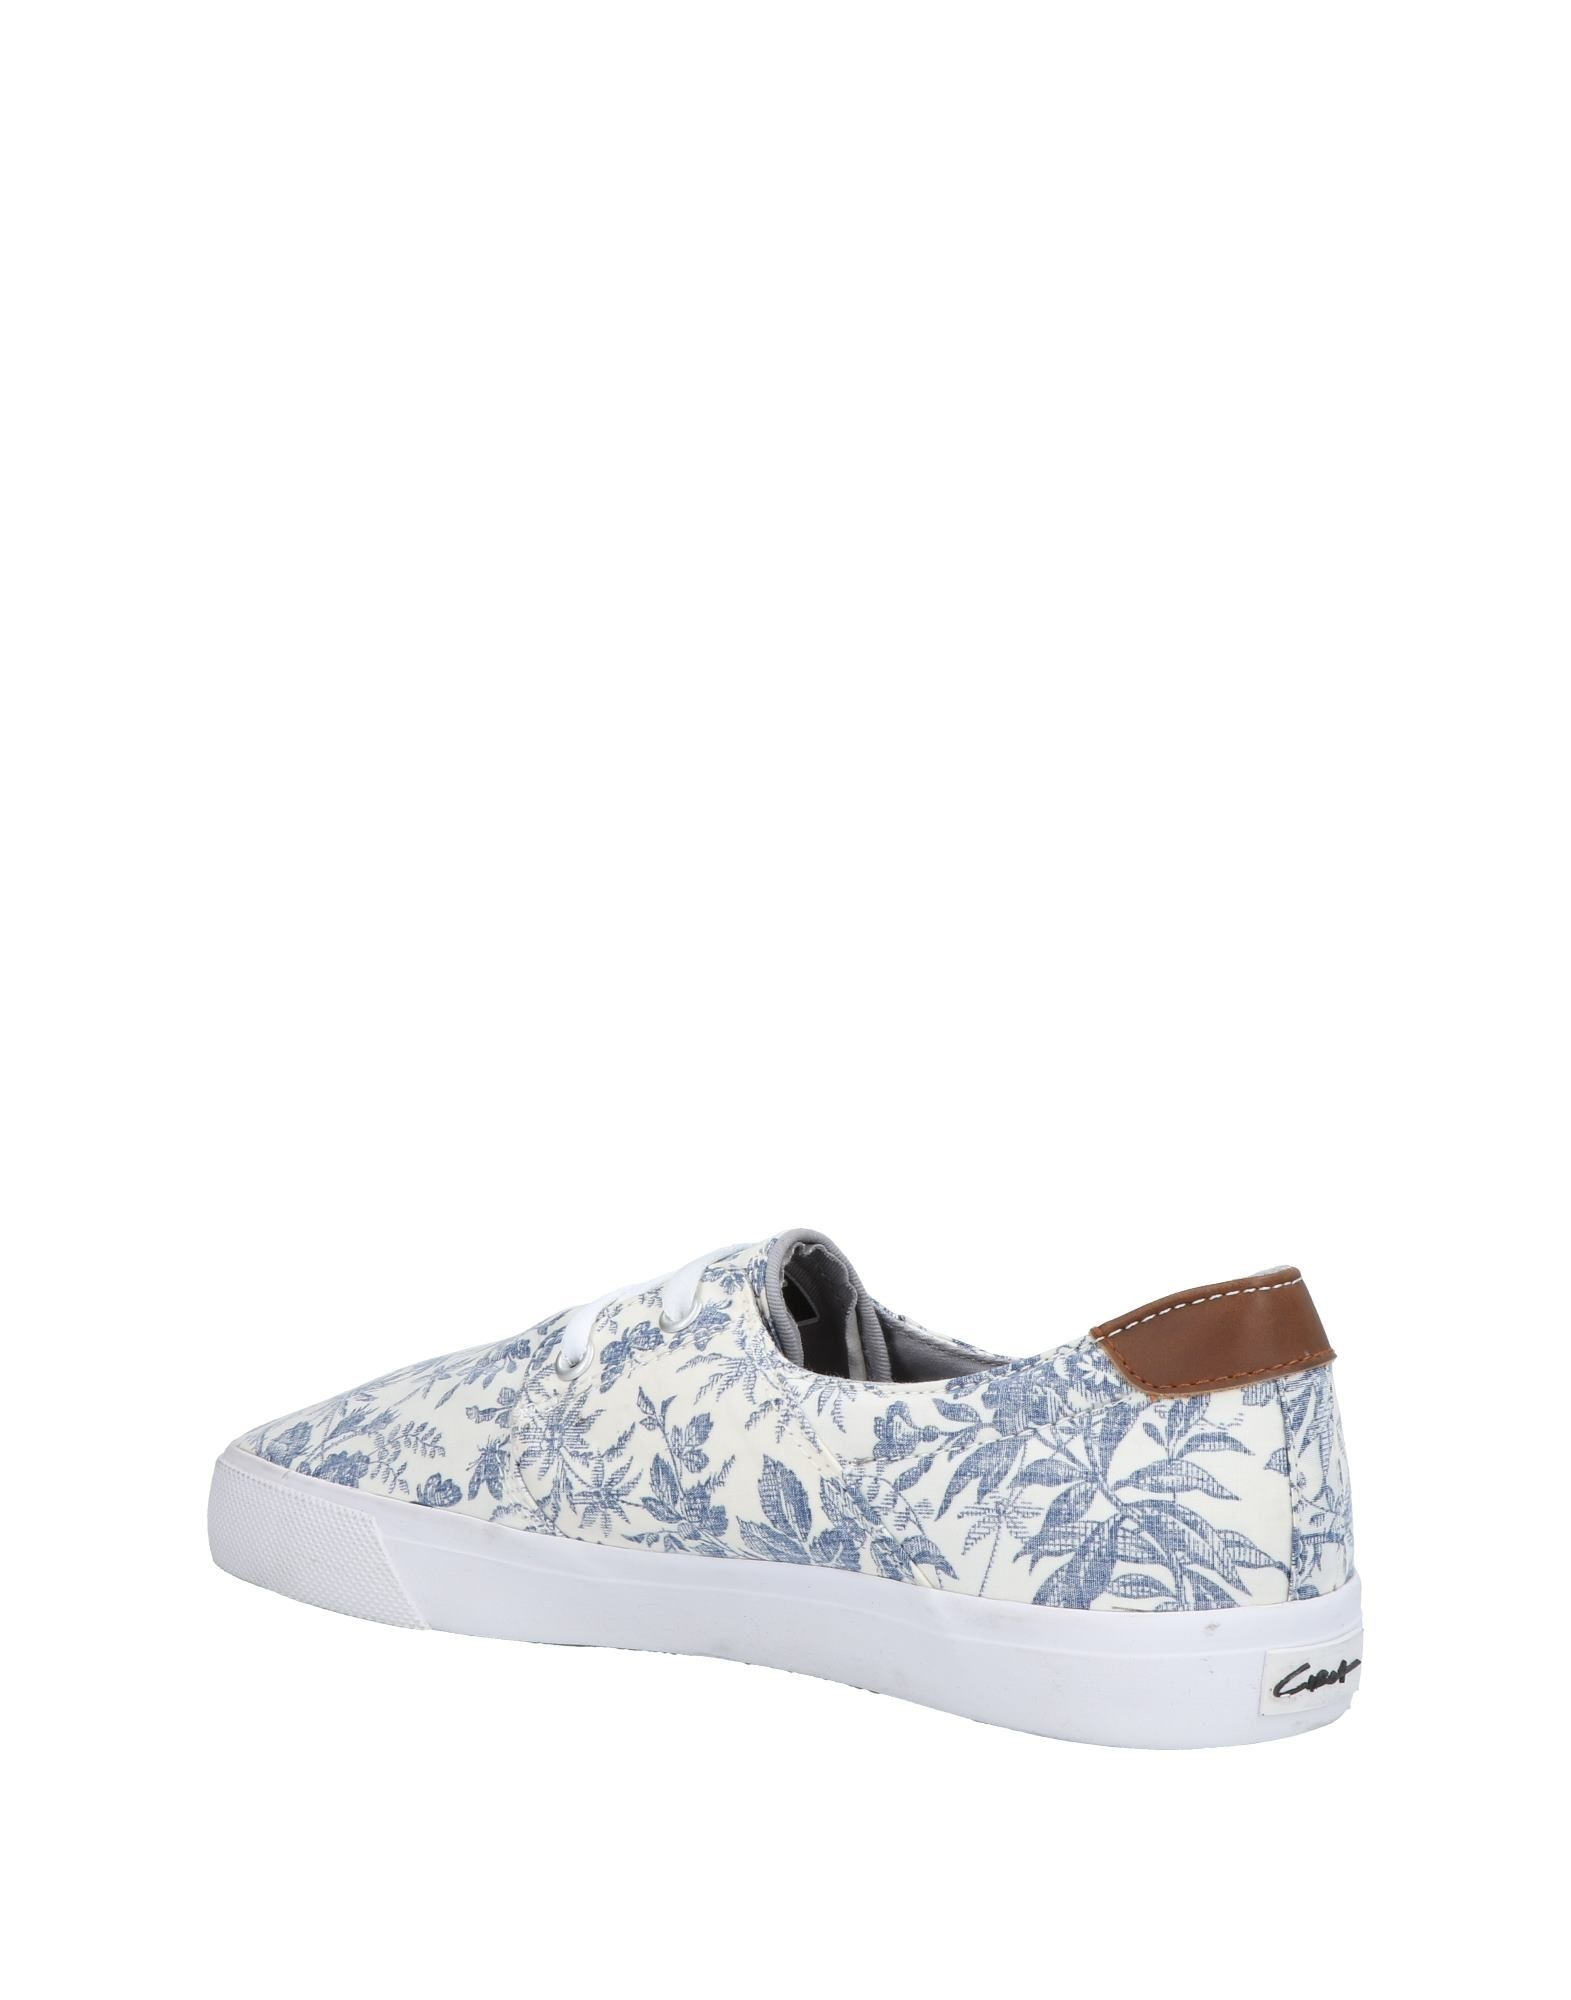 Sneakers C1rca Homme - Sneakers C1rca sur